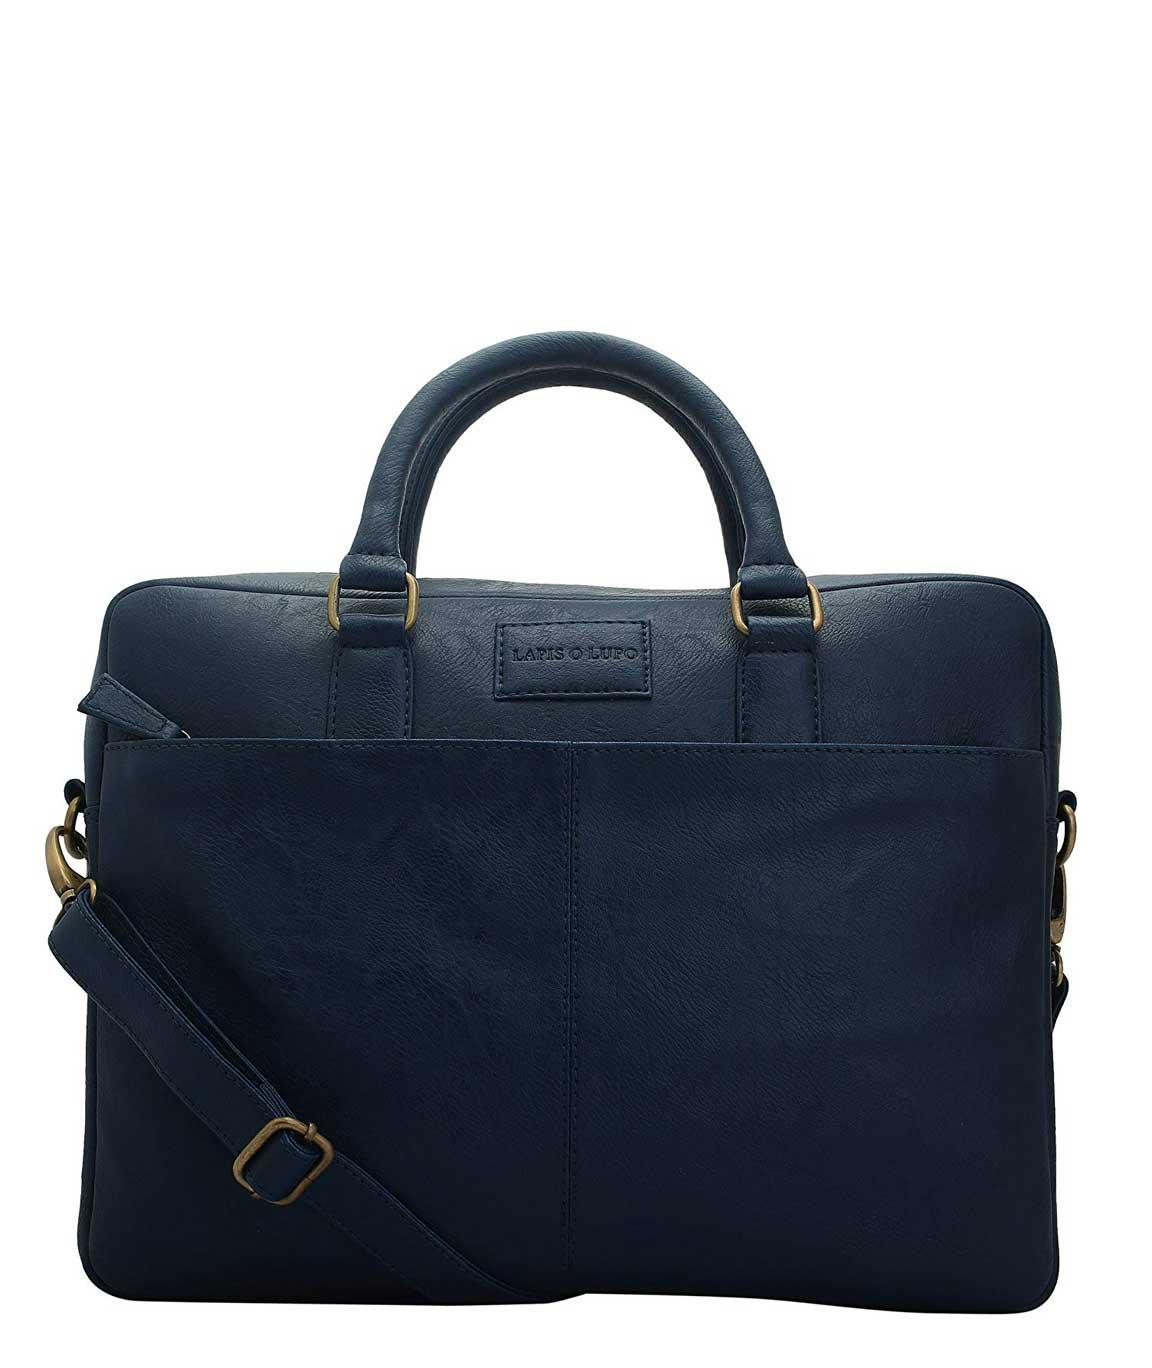 Lapis O Lupo Polyester Blue Laptop Briefcase